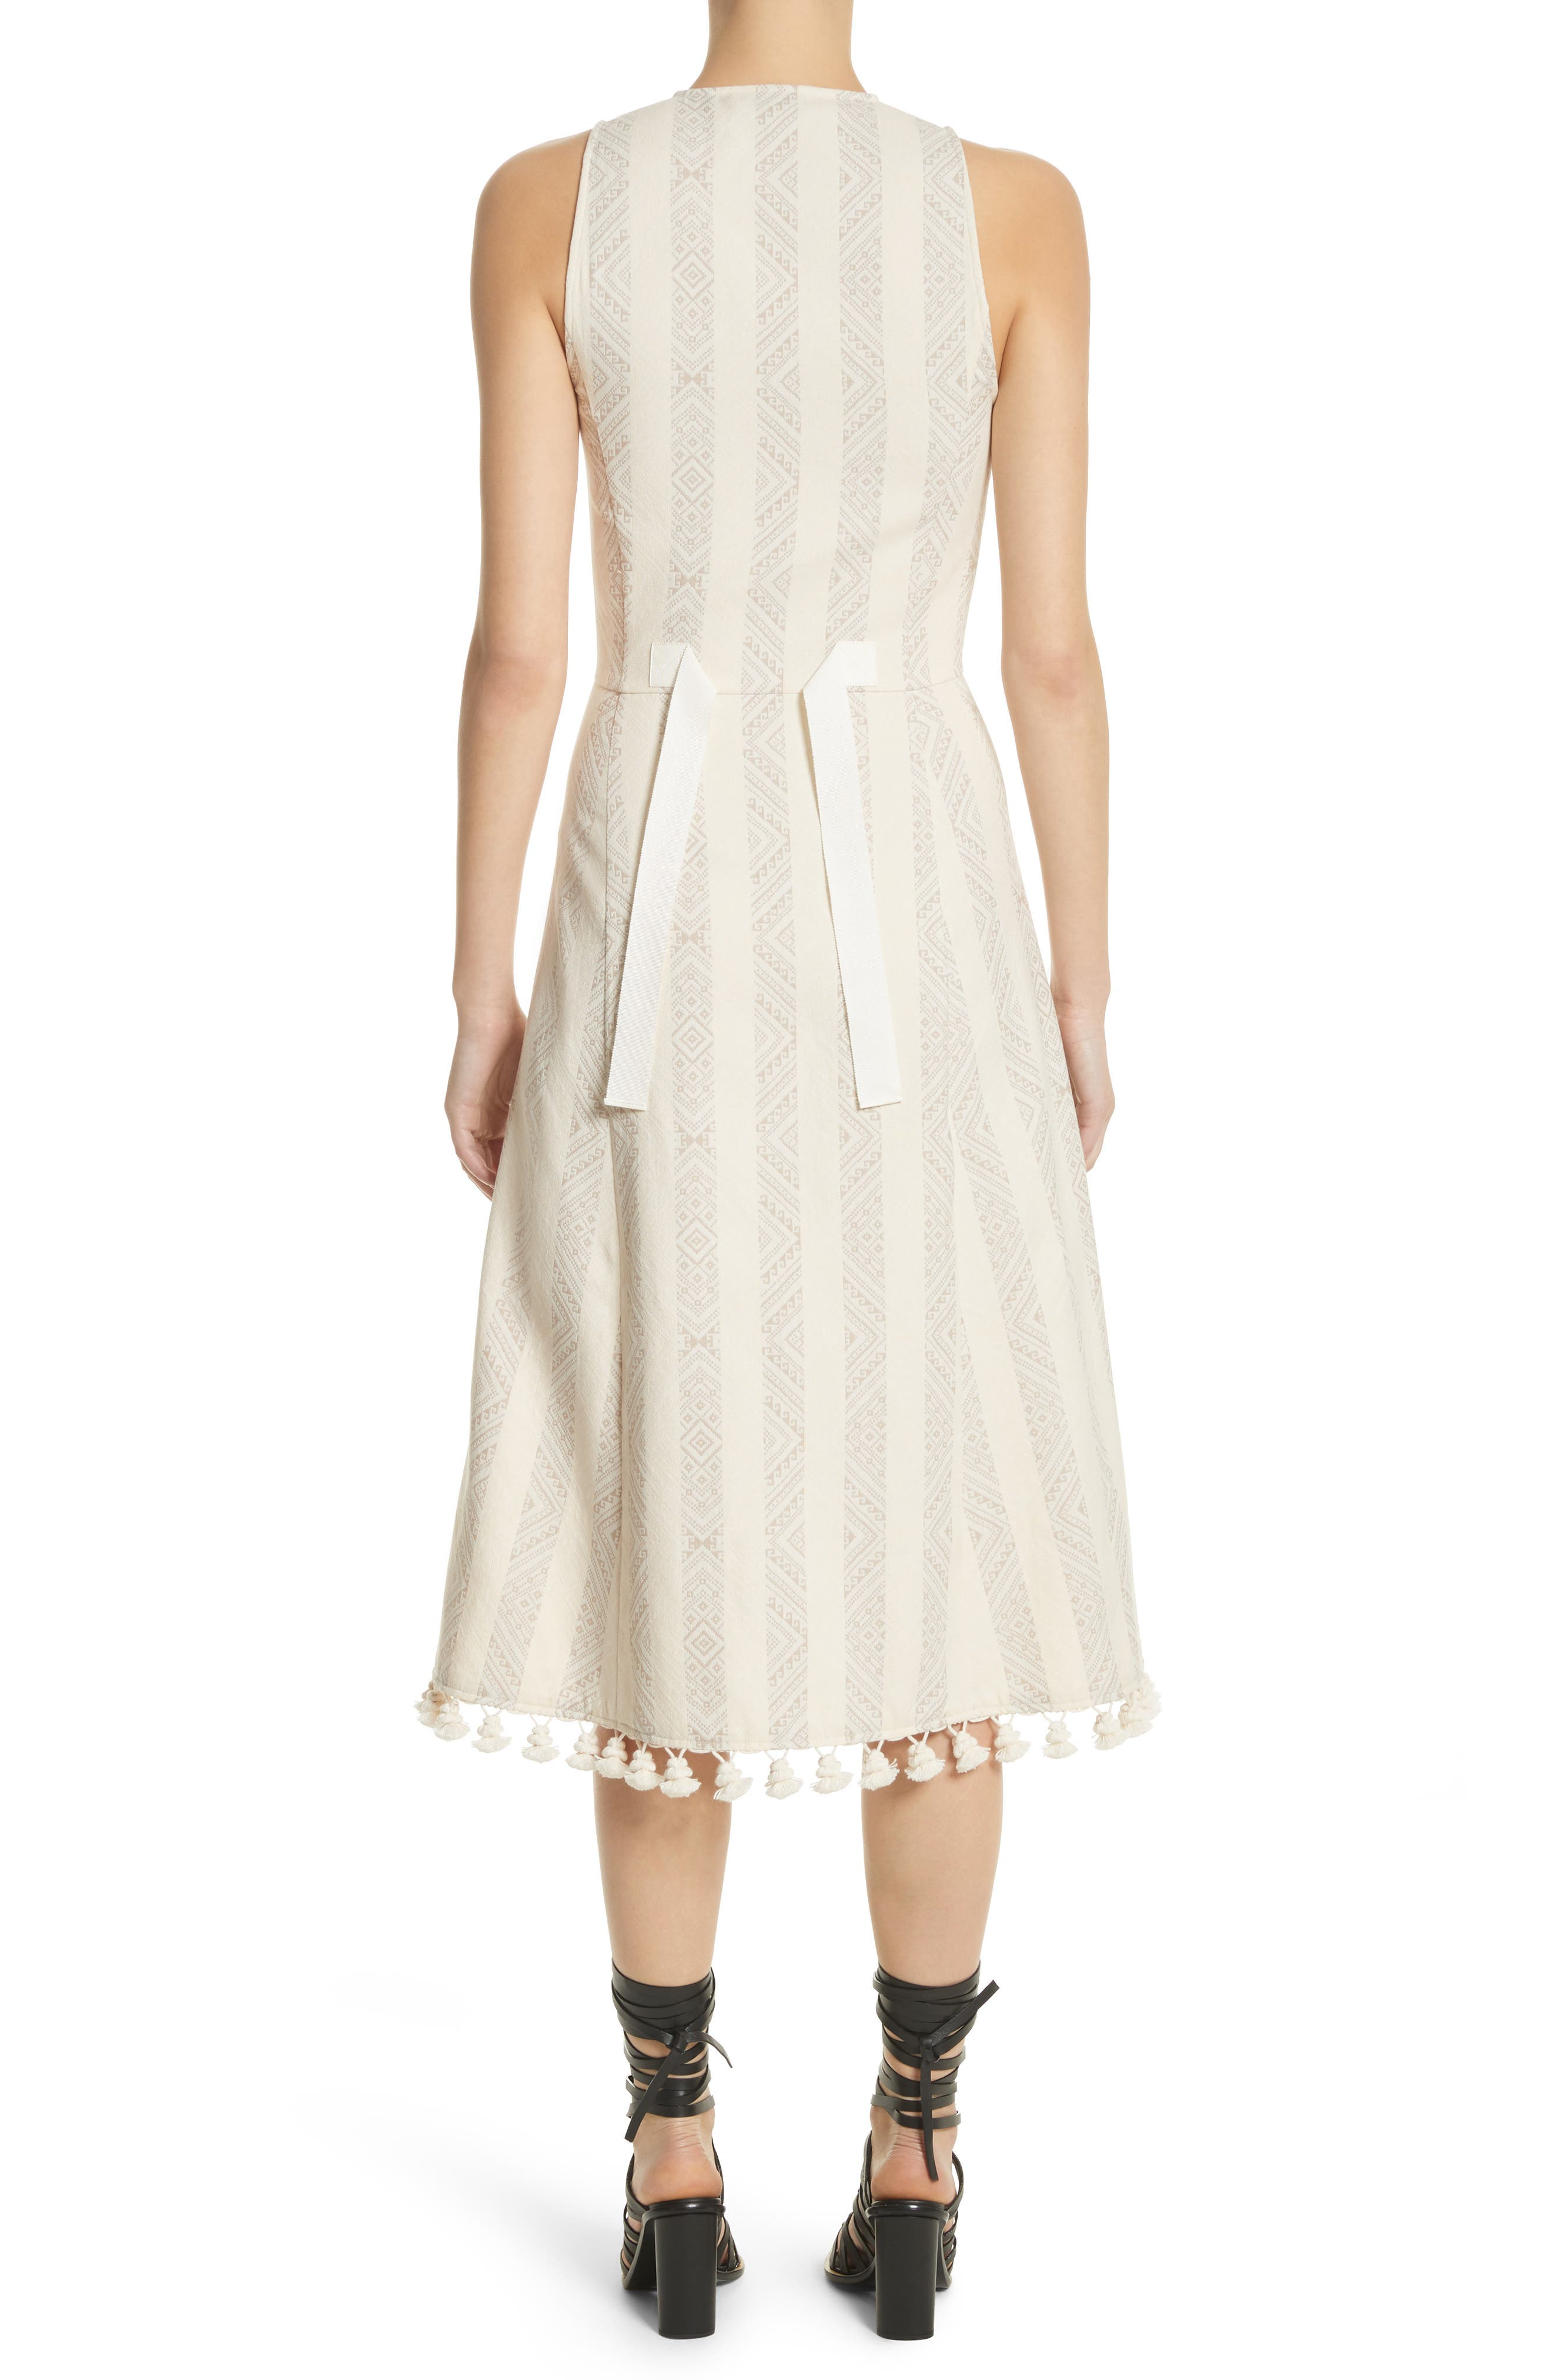 Grosgrain Tie Stripe Dress,                             Alternate thumbnail 2, color,                             106